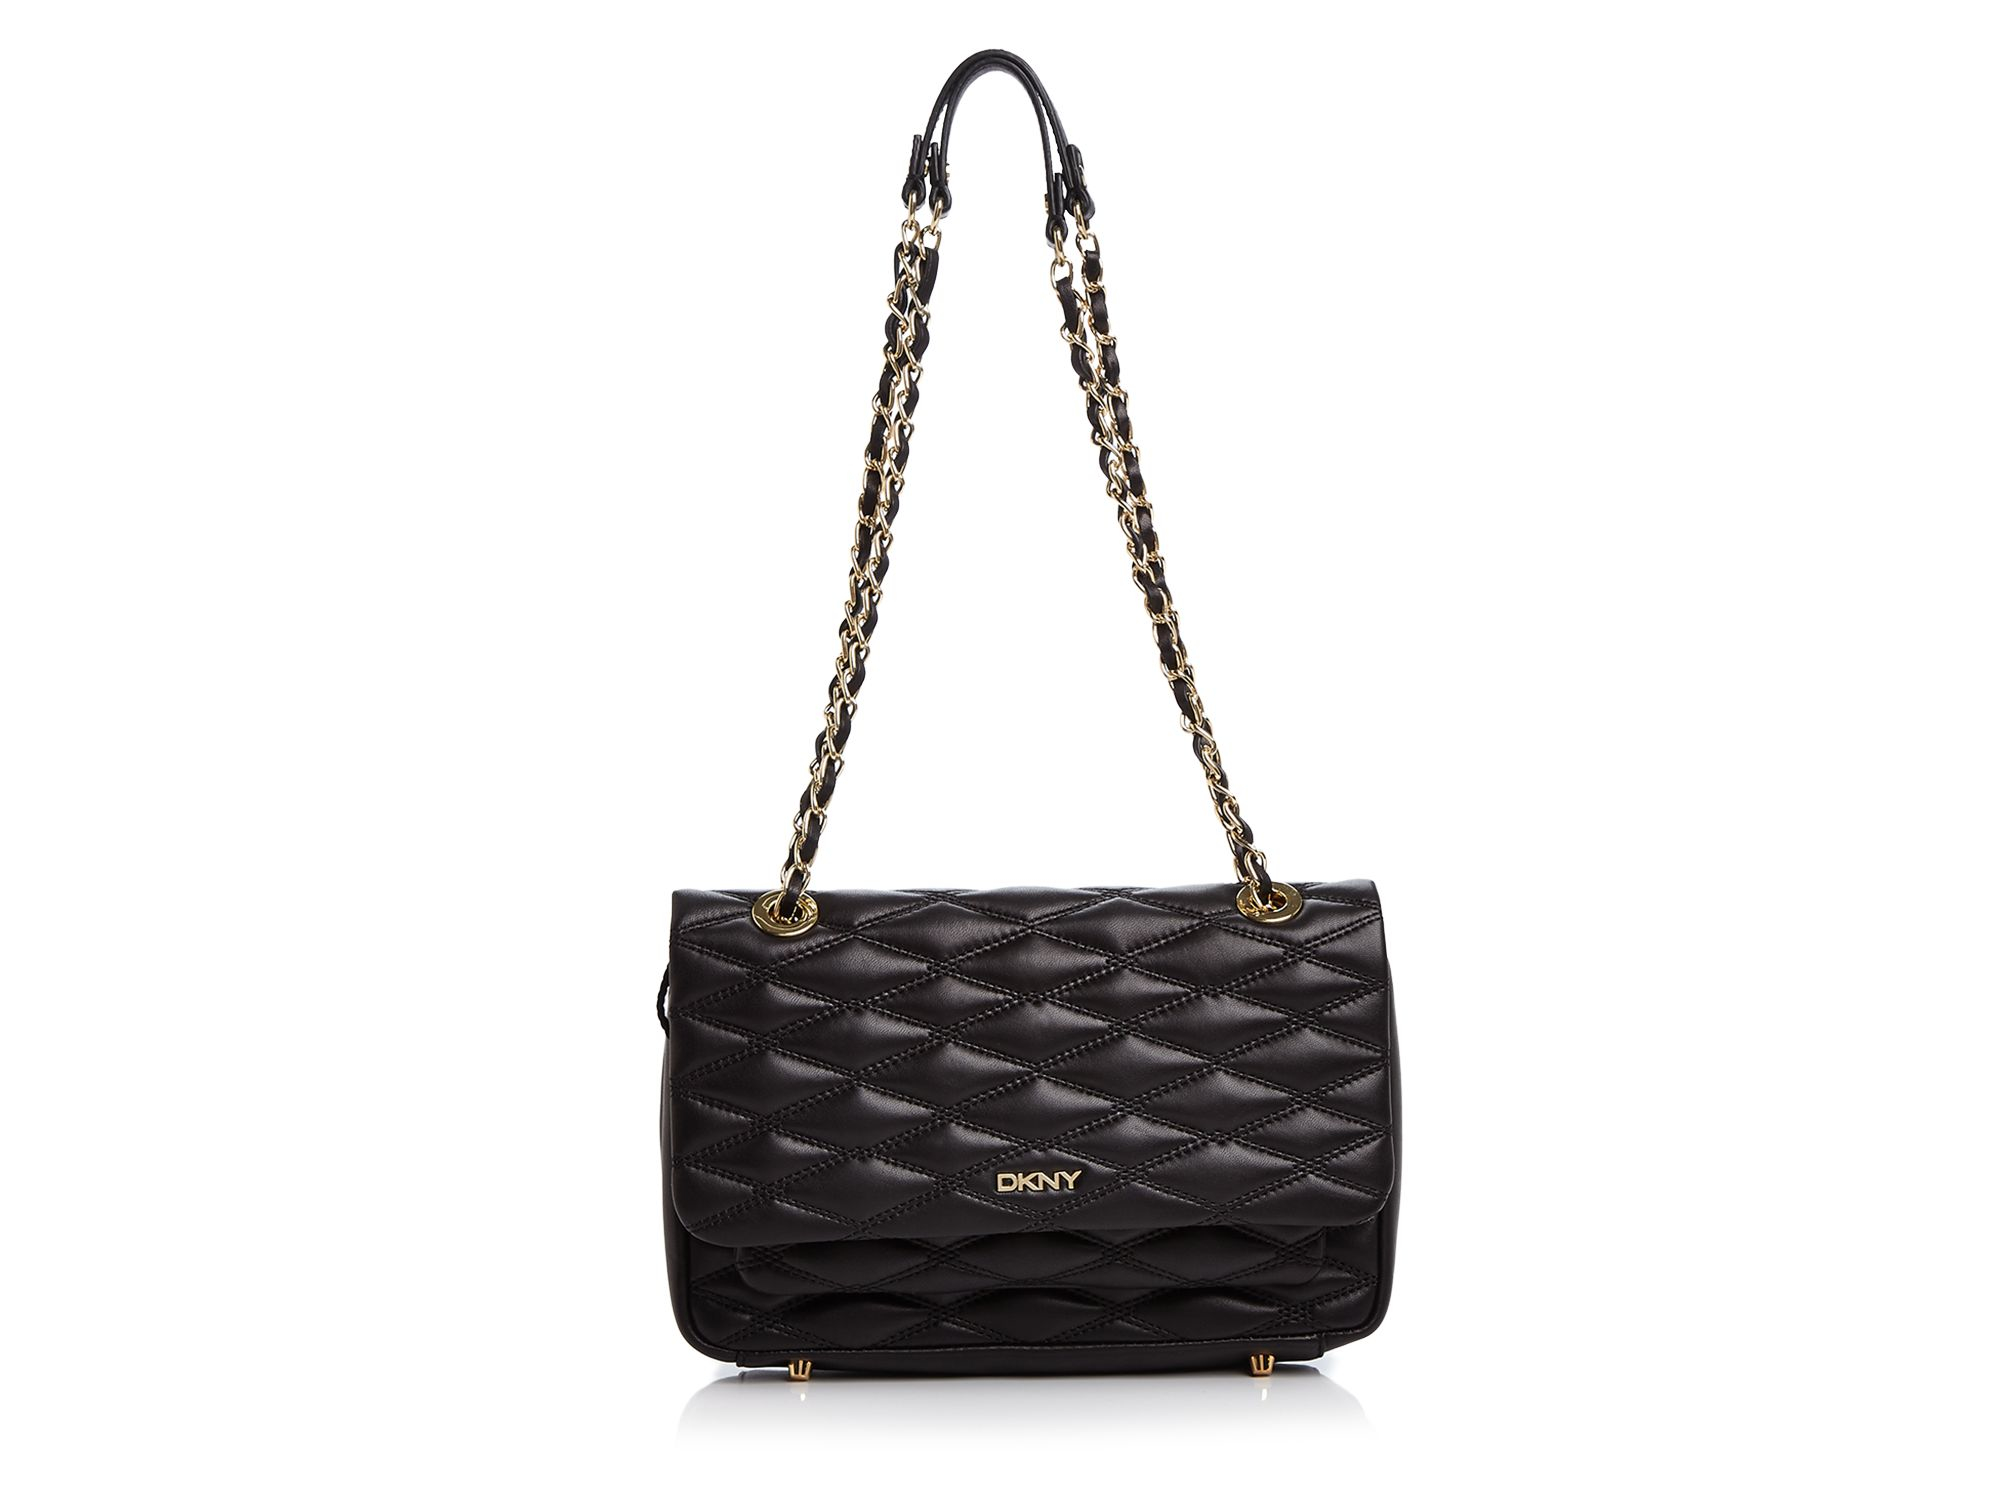 Lyst - Dkny Gansevoort Quilted Nappa Flap Pocket Shoulder Bag in Black : dkny black quilted purse - Adamdwight.com